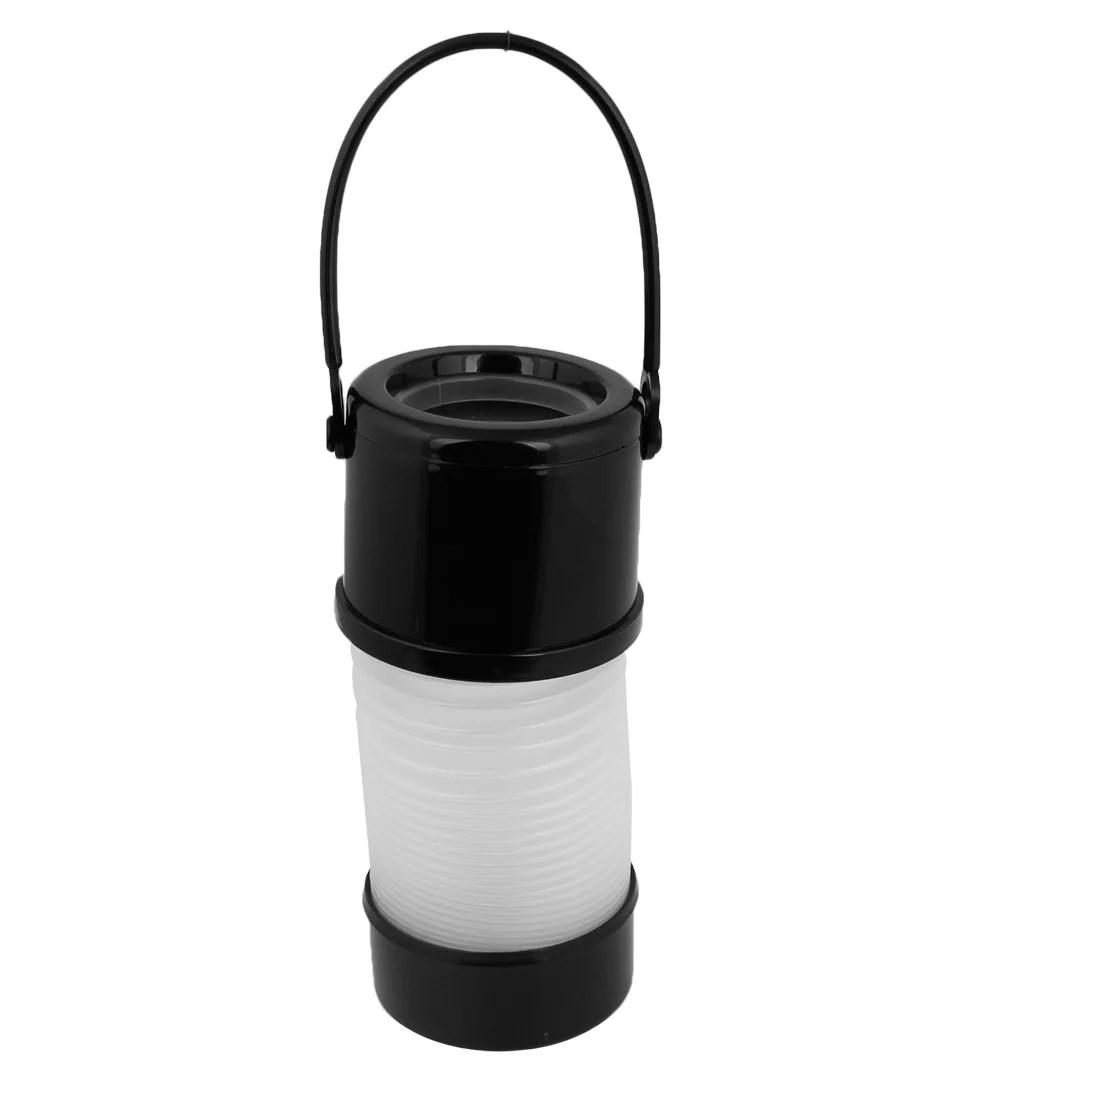 Black Foldable Contractible Bucket Umbrella Holder for Car